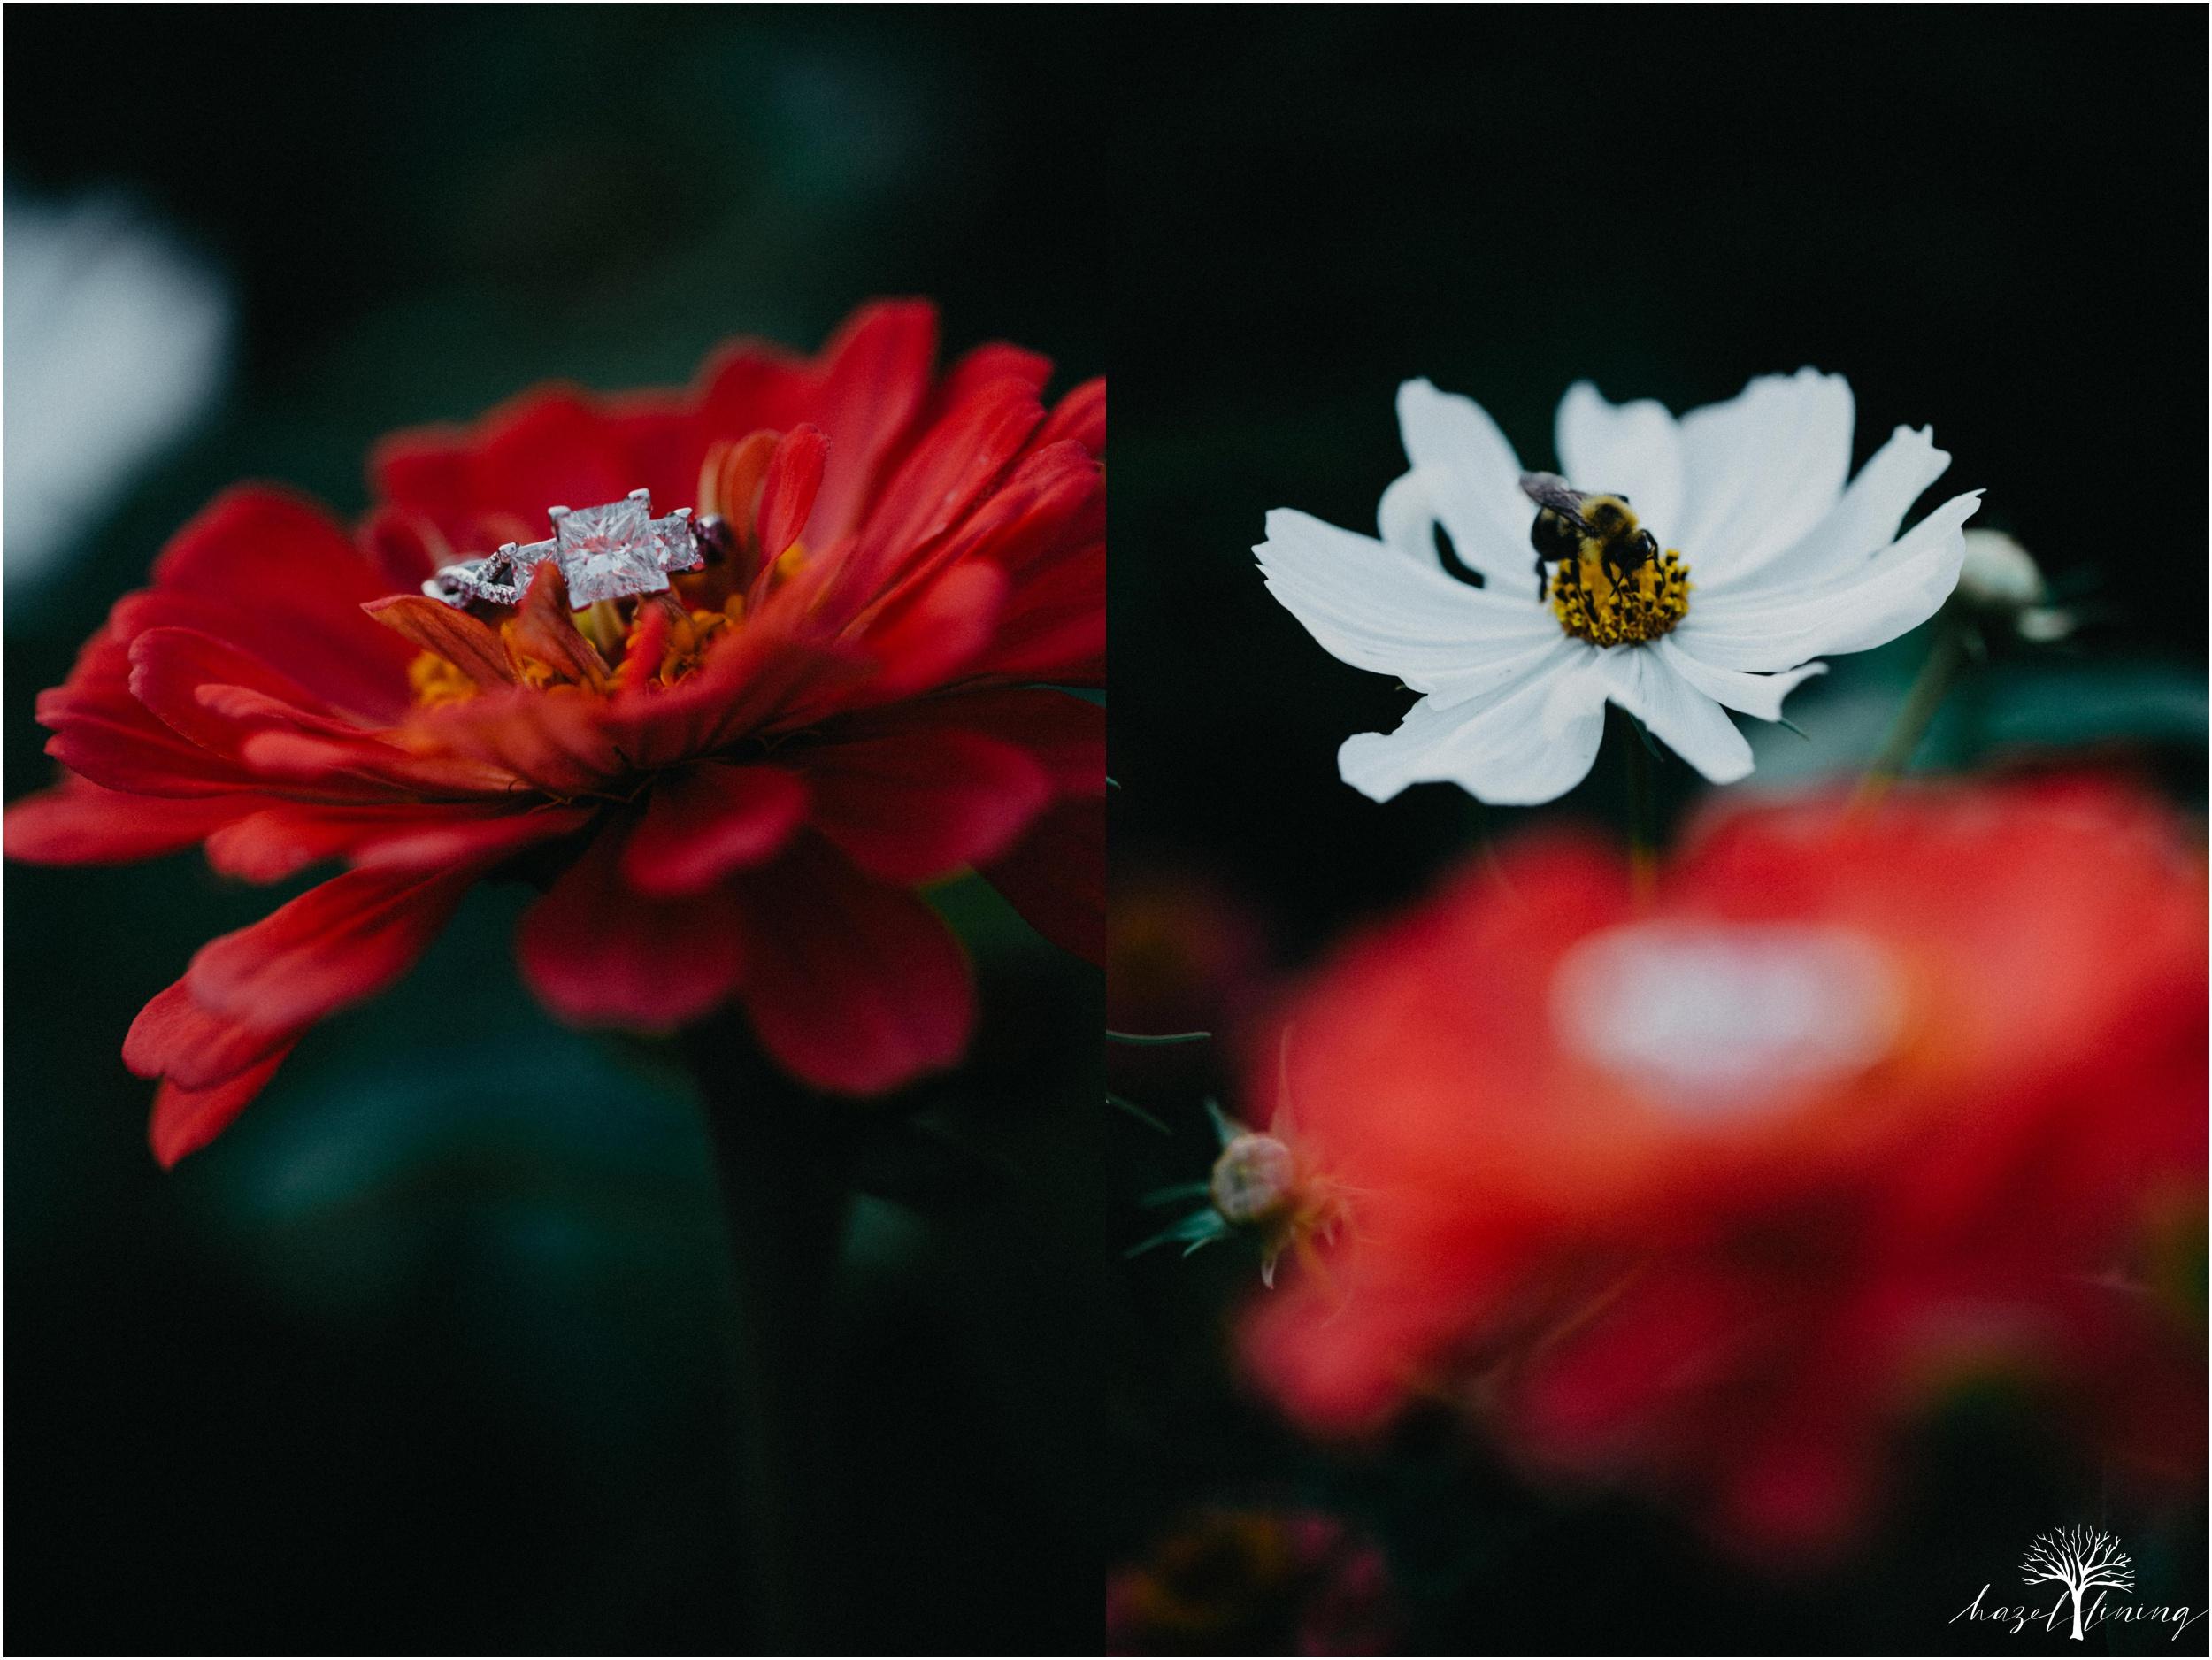 rachel-warner-chris-niedrist-the-farm-bakery-and-events-quakertown-pa-summer-engagement-hazel-lining-photography-destination-elopement-wedding-engagement-photography_0030.jpg